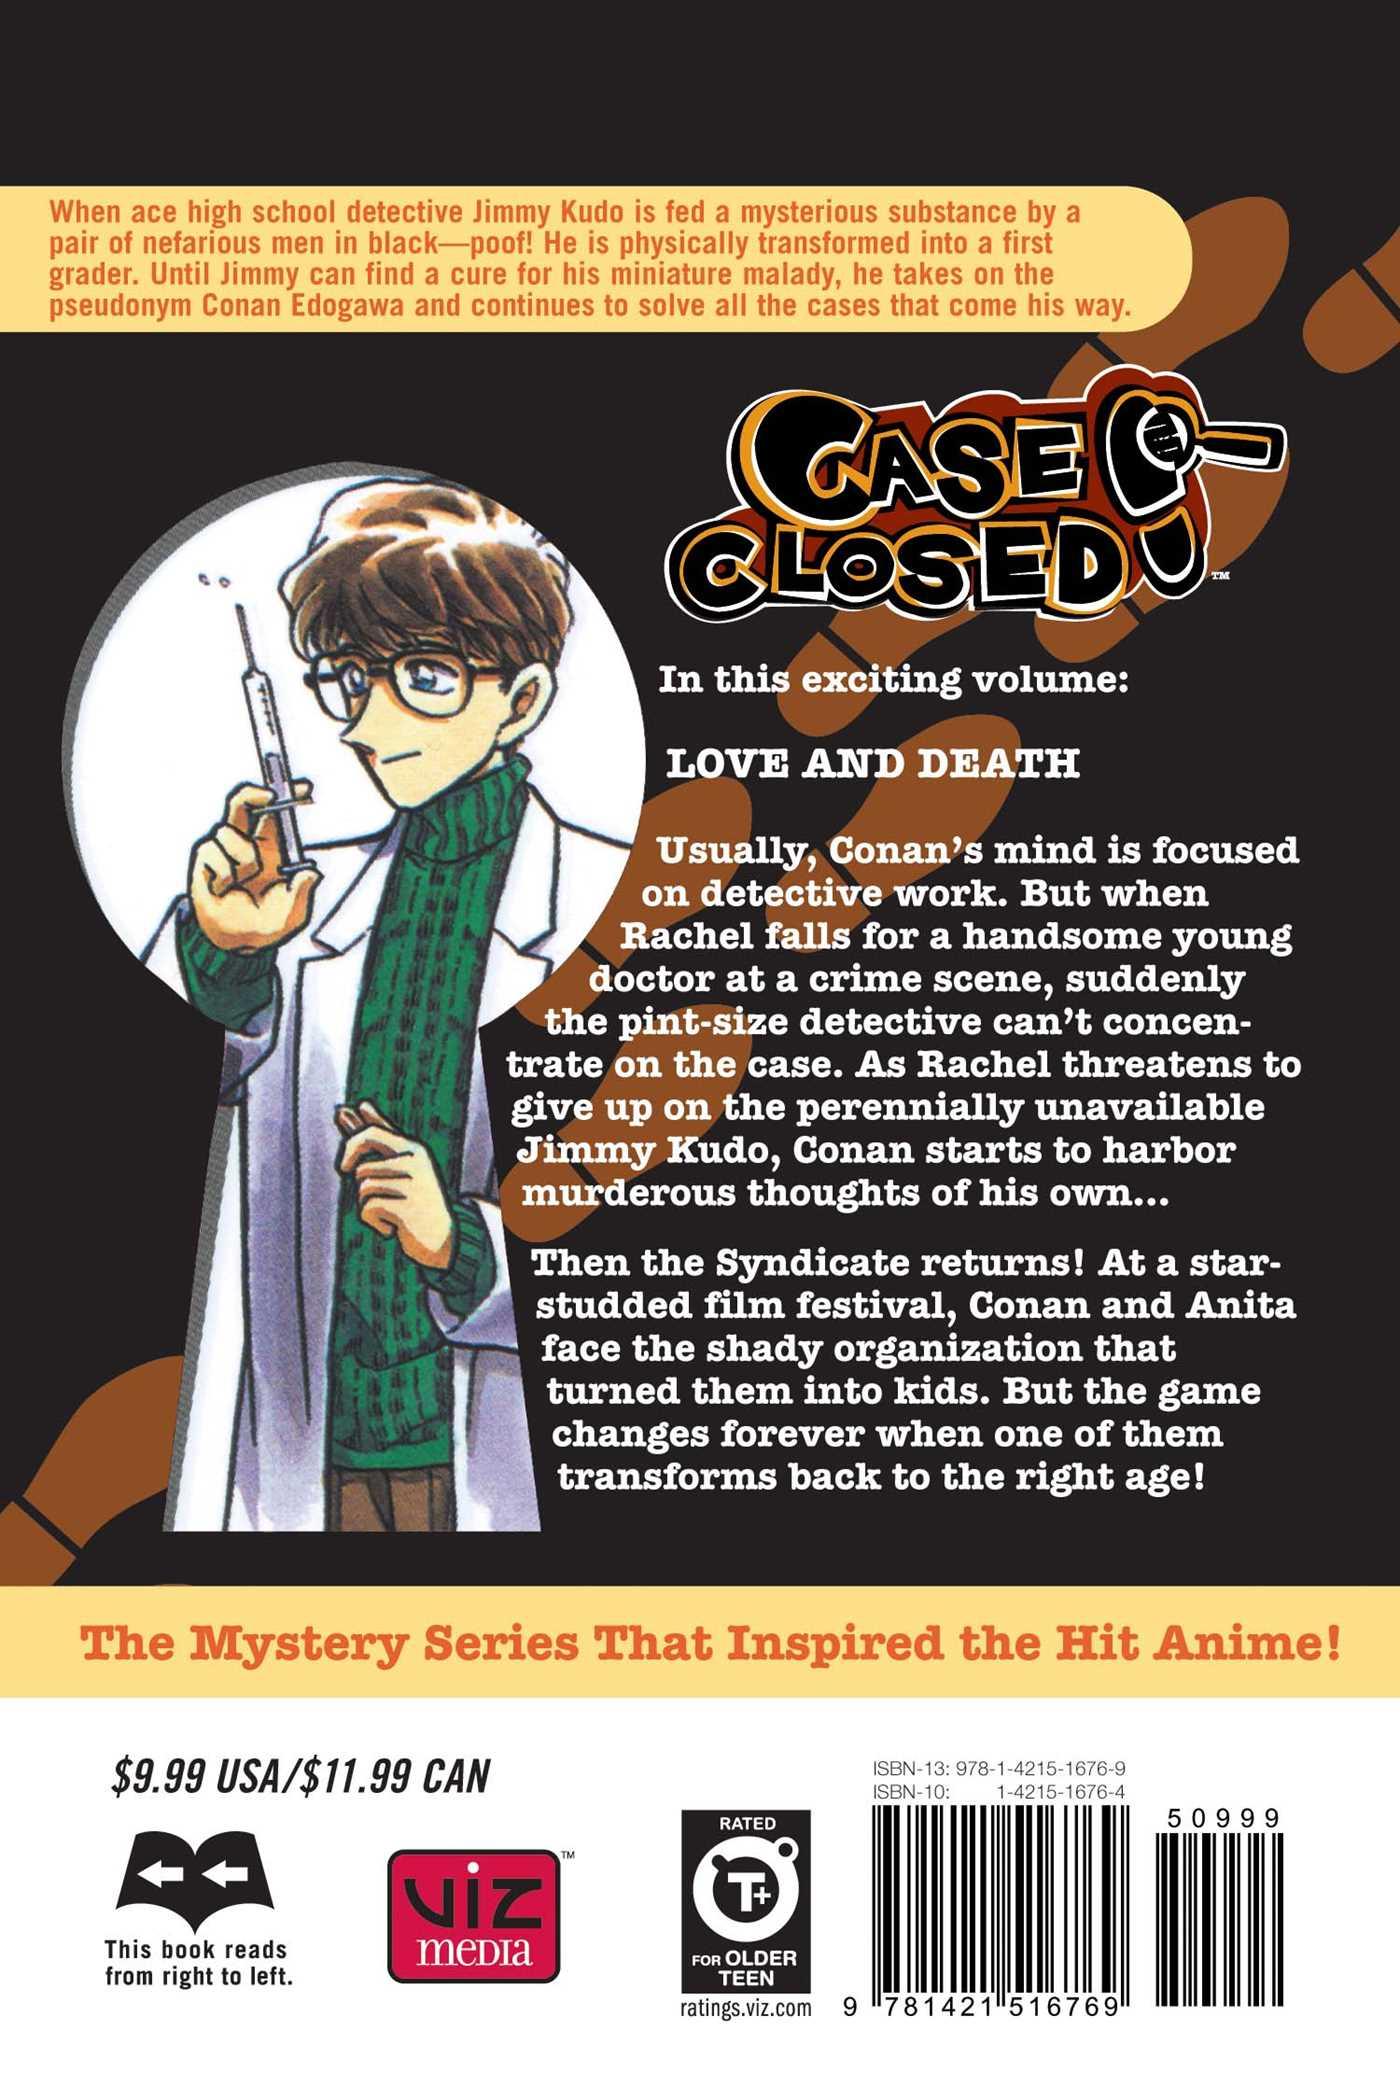 Case closed vol 24 9781421516769 hr back